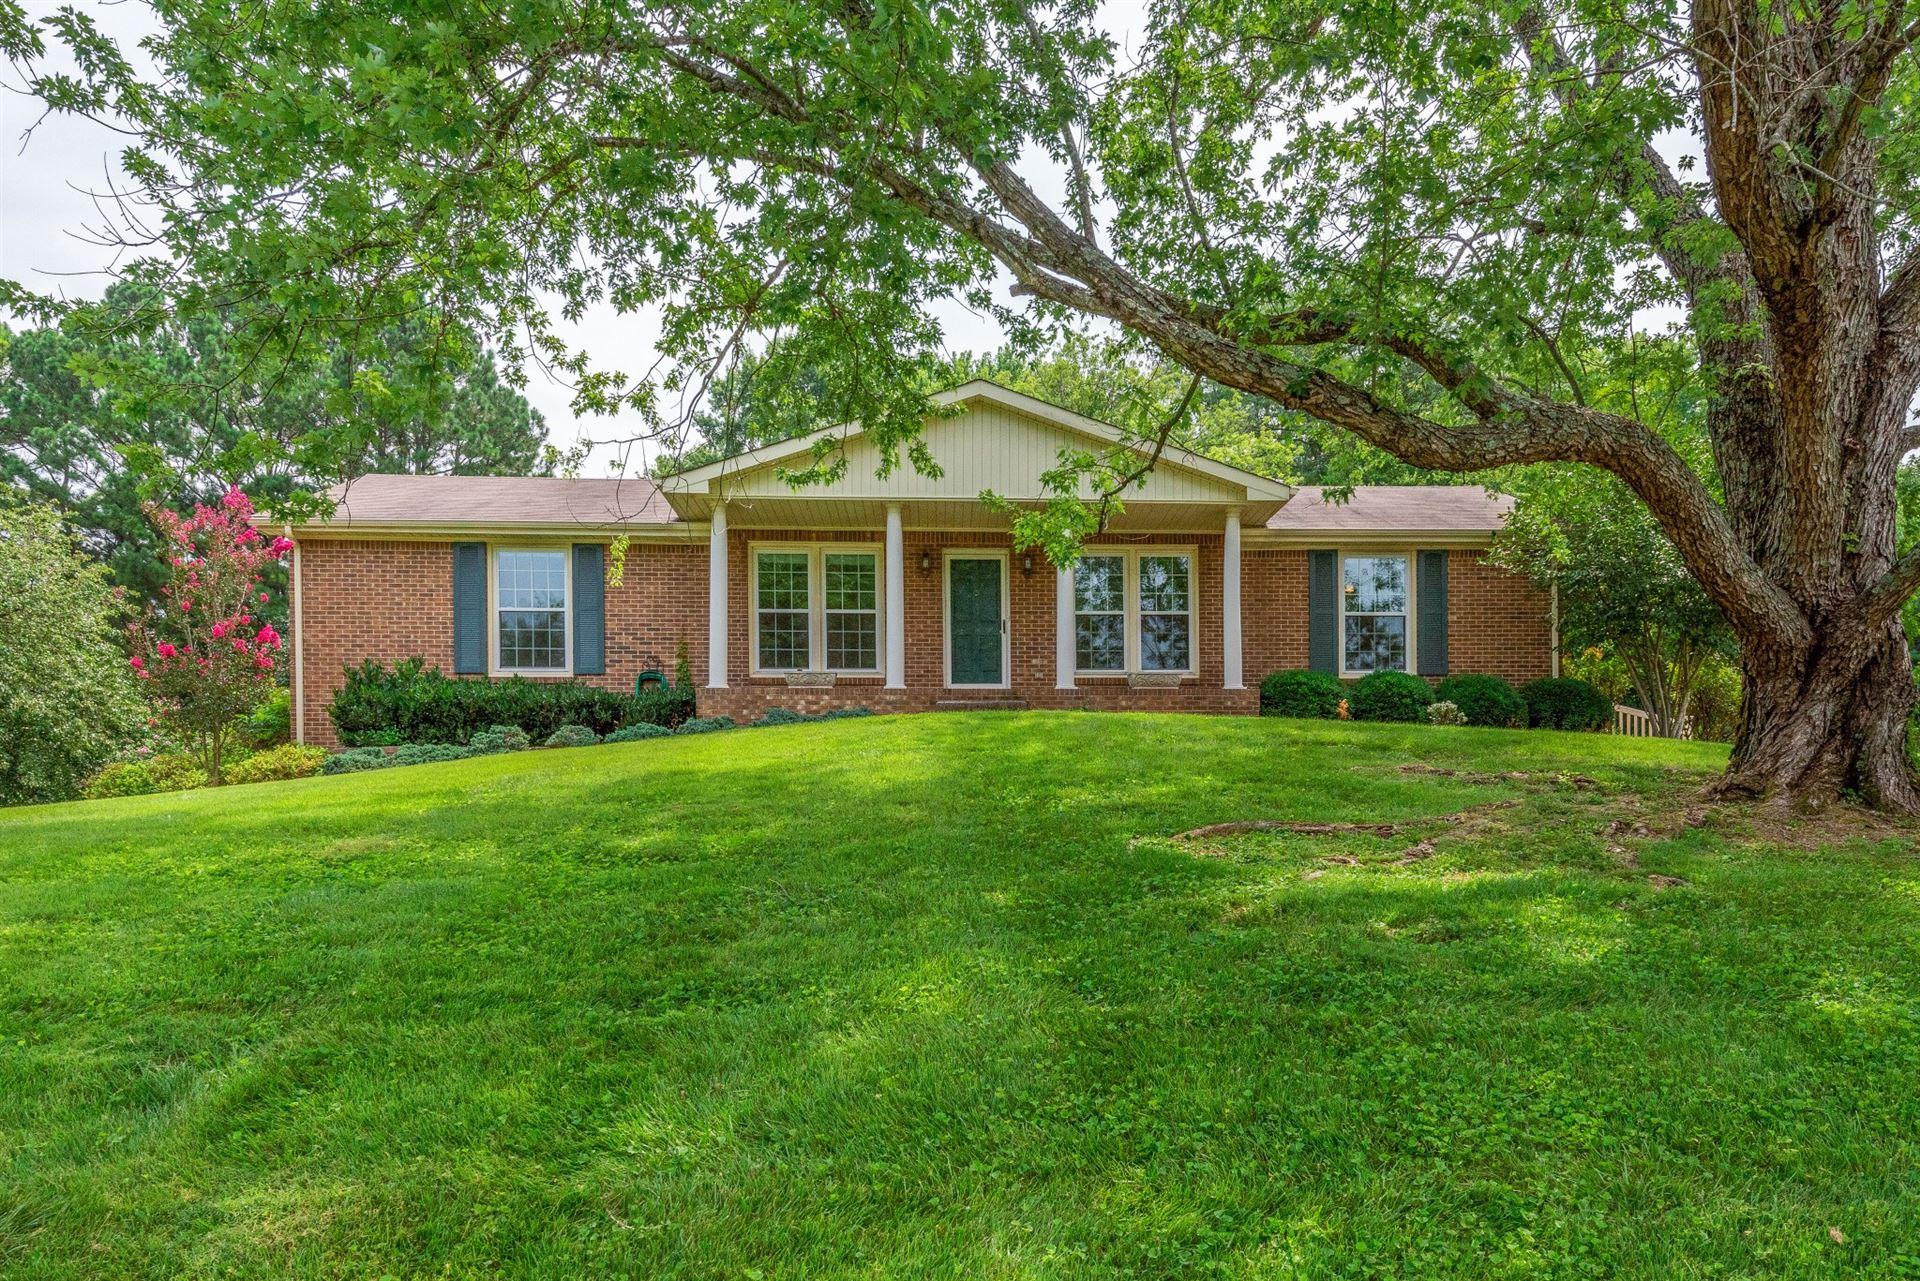 1785 Auburn Dr, Clarksville, TN 37043 - MLS#: 2278650